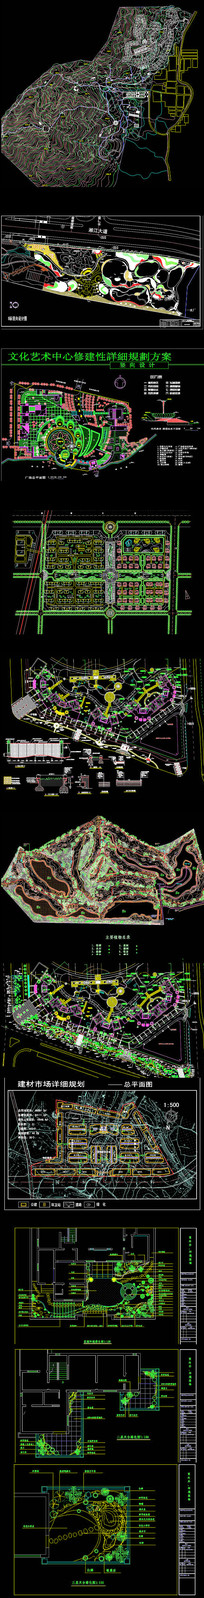 cad公园设计平面图